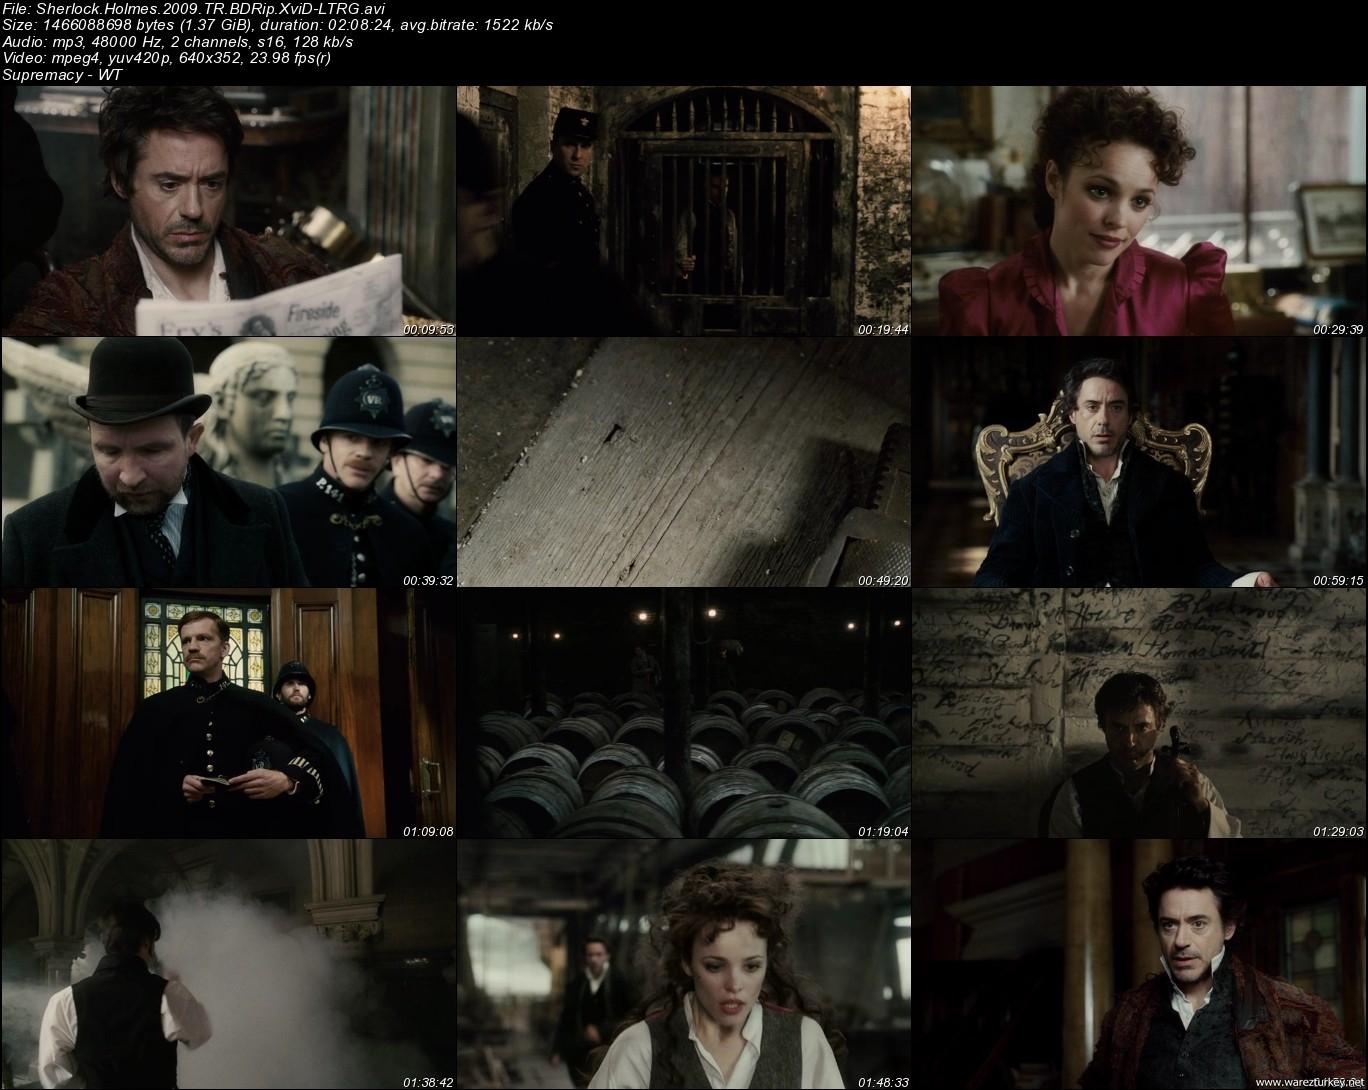 Sherlock Holmes - 2009 Türkçe Dublaj BDRip indir